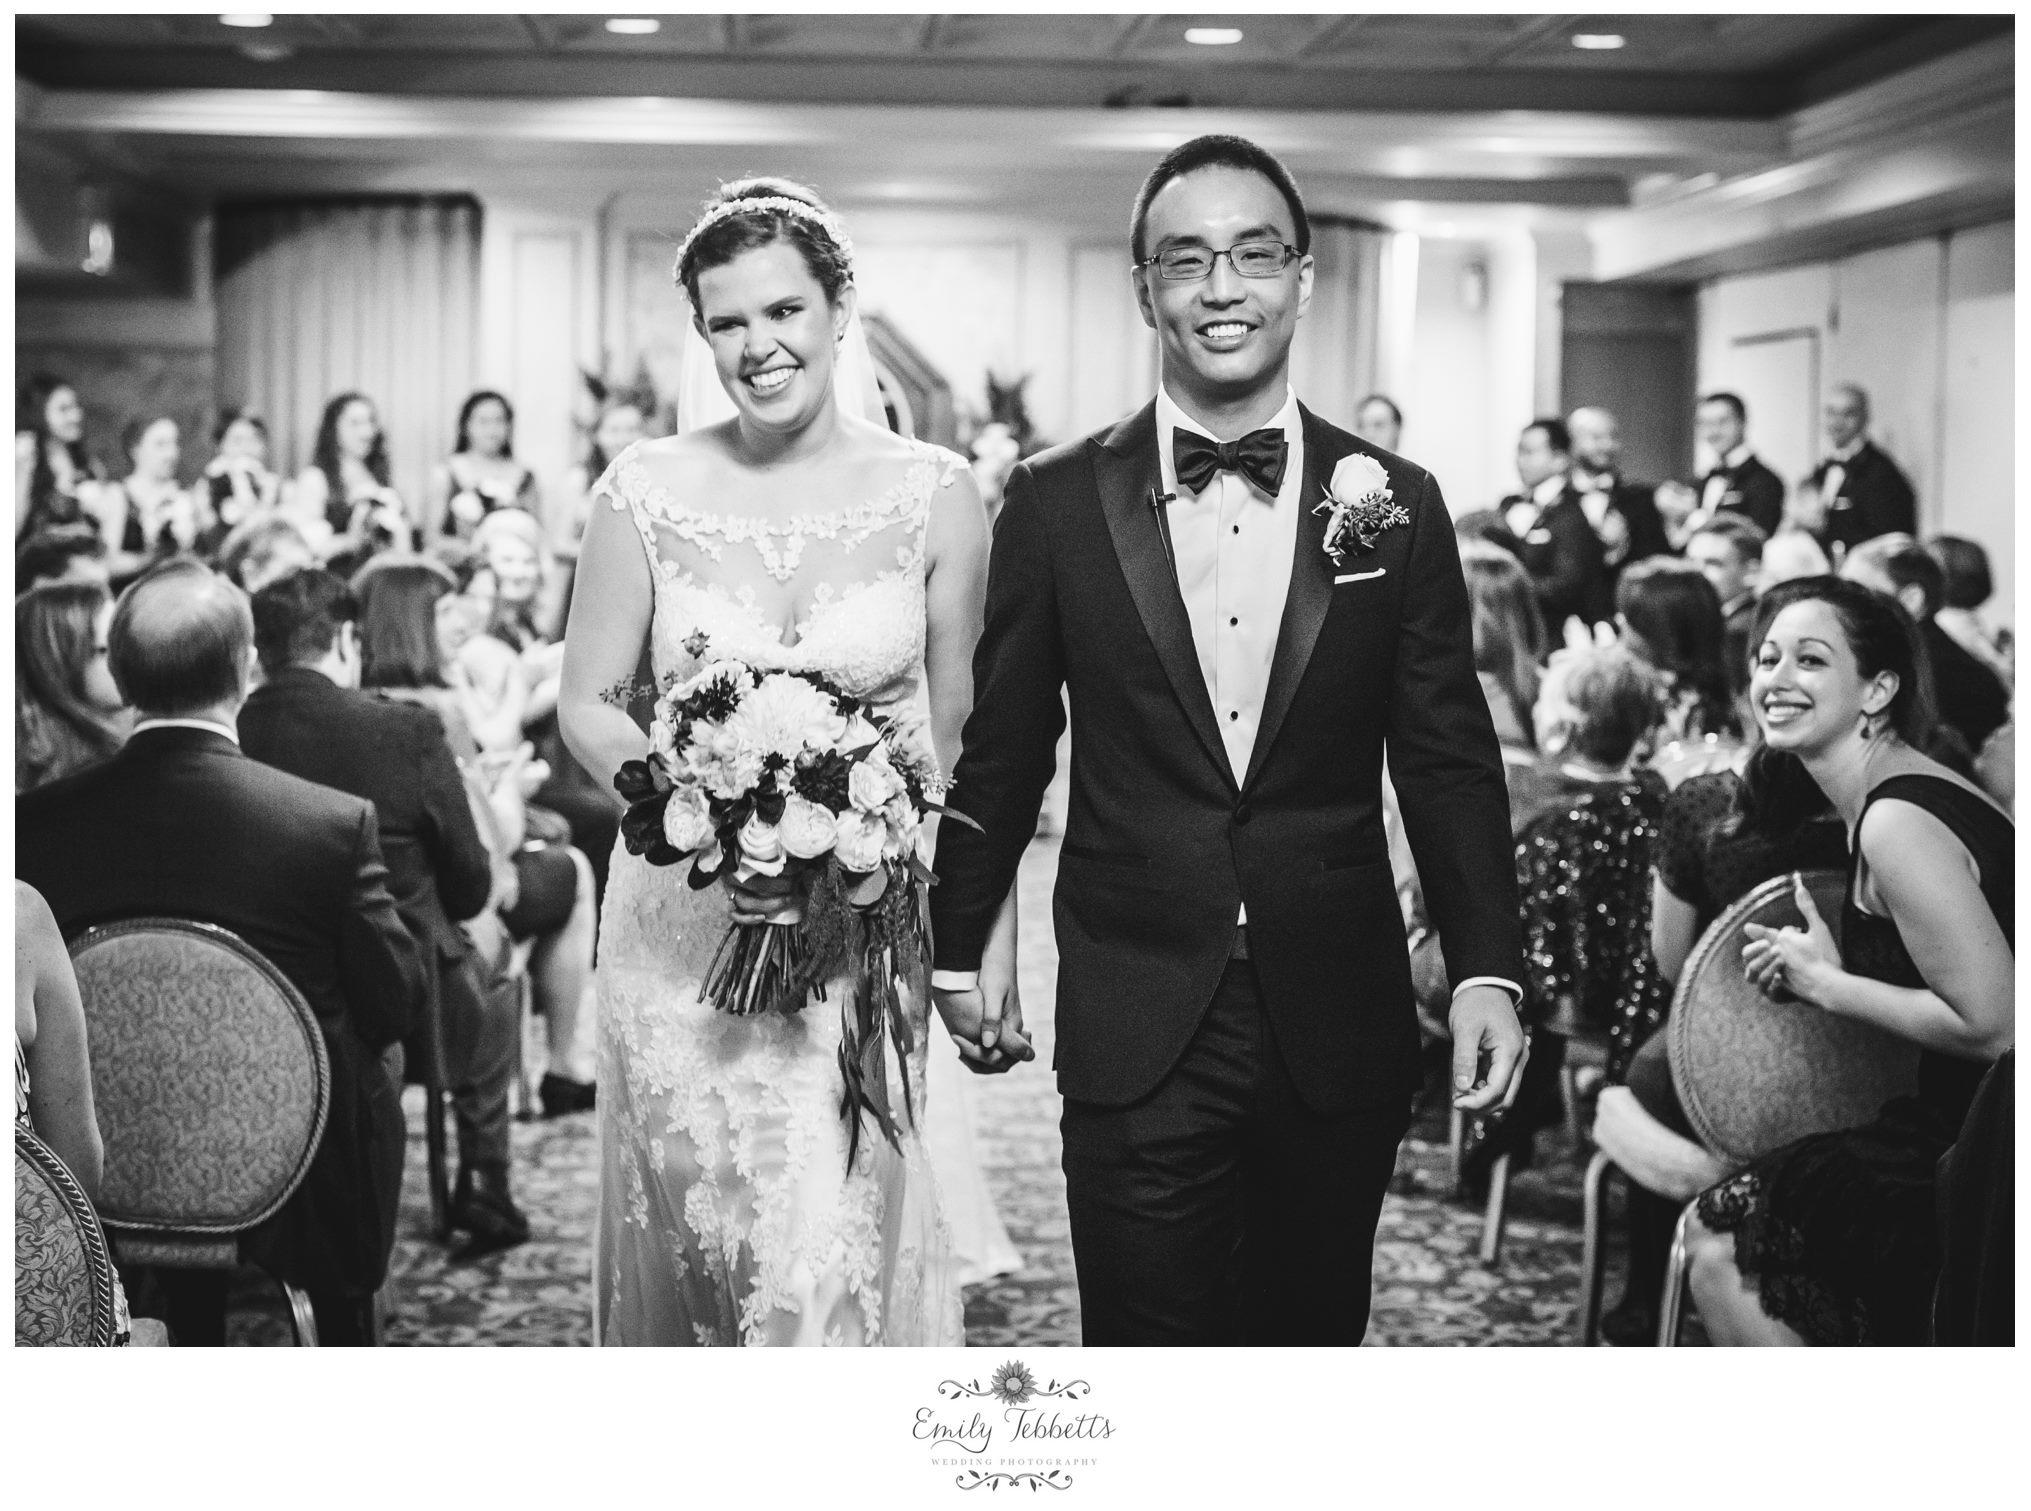 Basking Ridge, NJ - Emily Tebbetts Wedding Photography 5.jpg